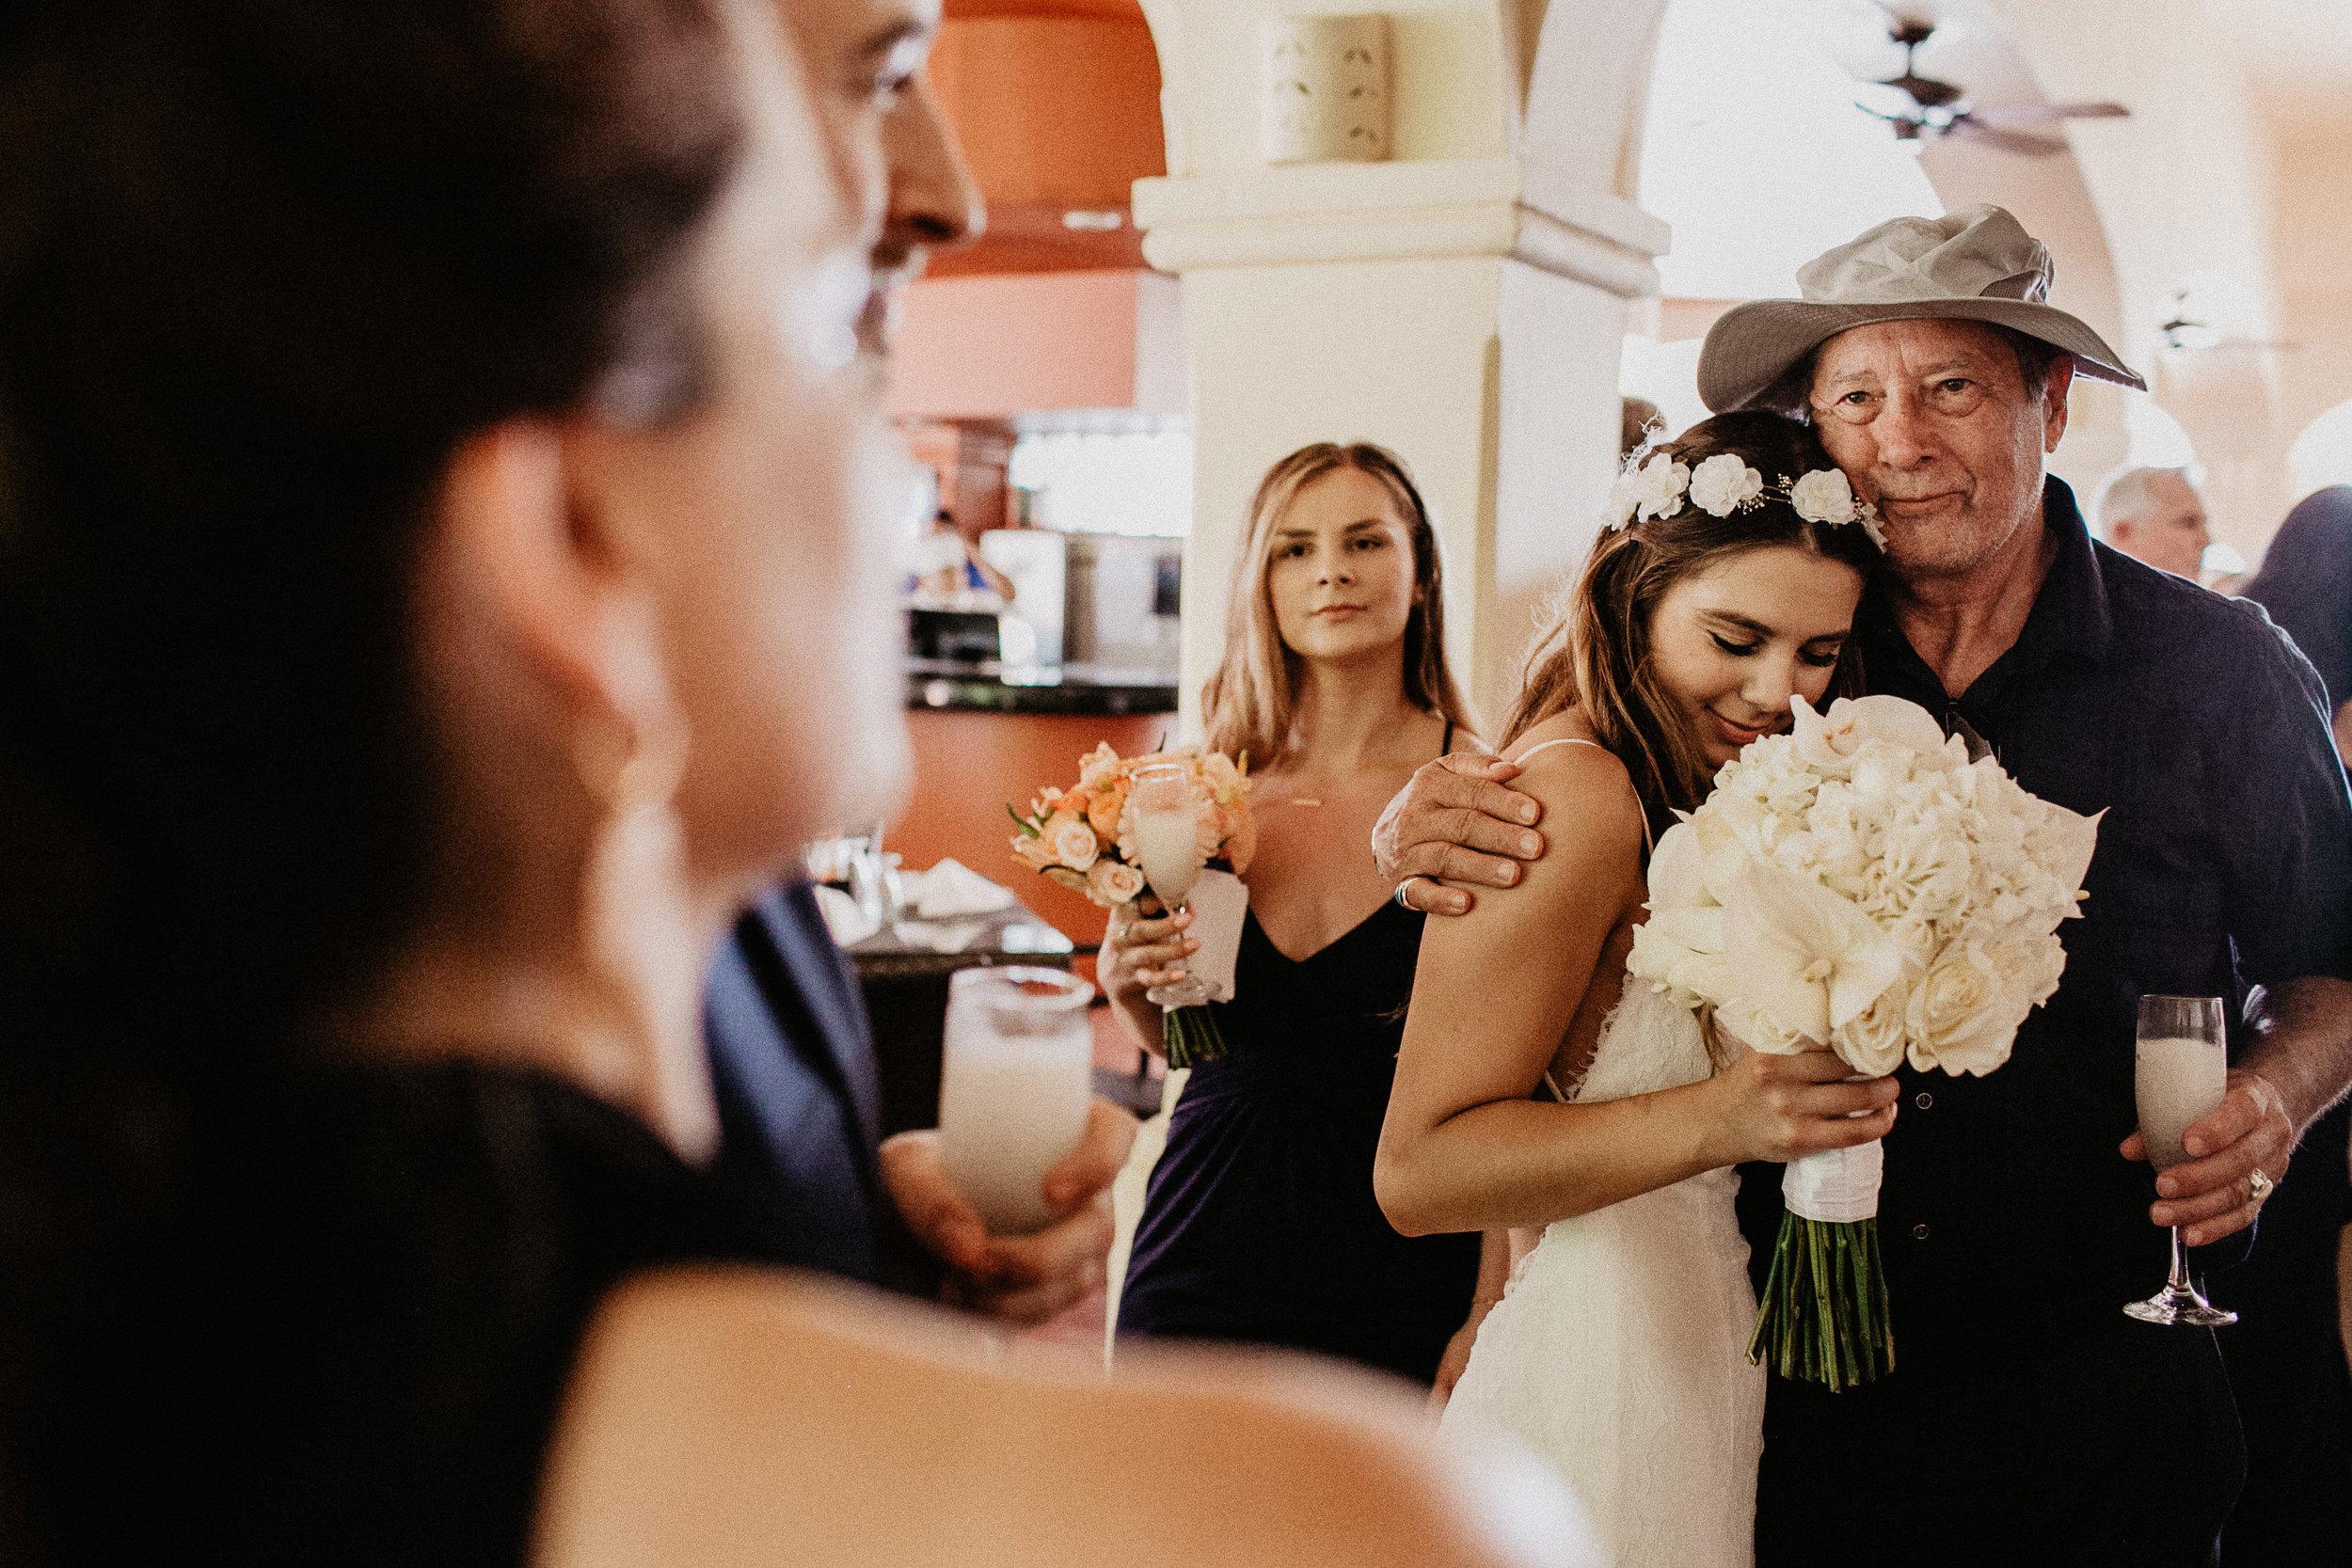 alfonso_flores_destination_wedding_photography_puerto_vallarta_hotel_barcelo_vallarta_cuttler_amela-274.JPG